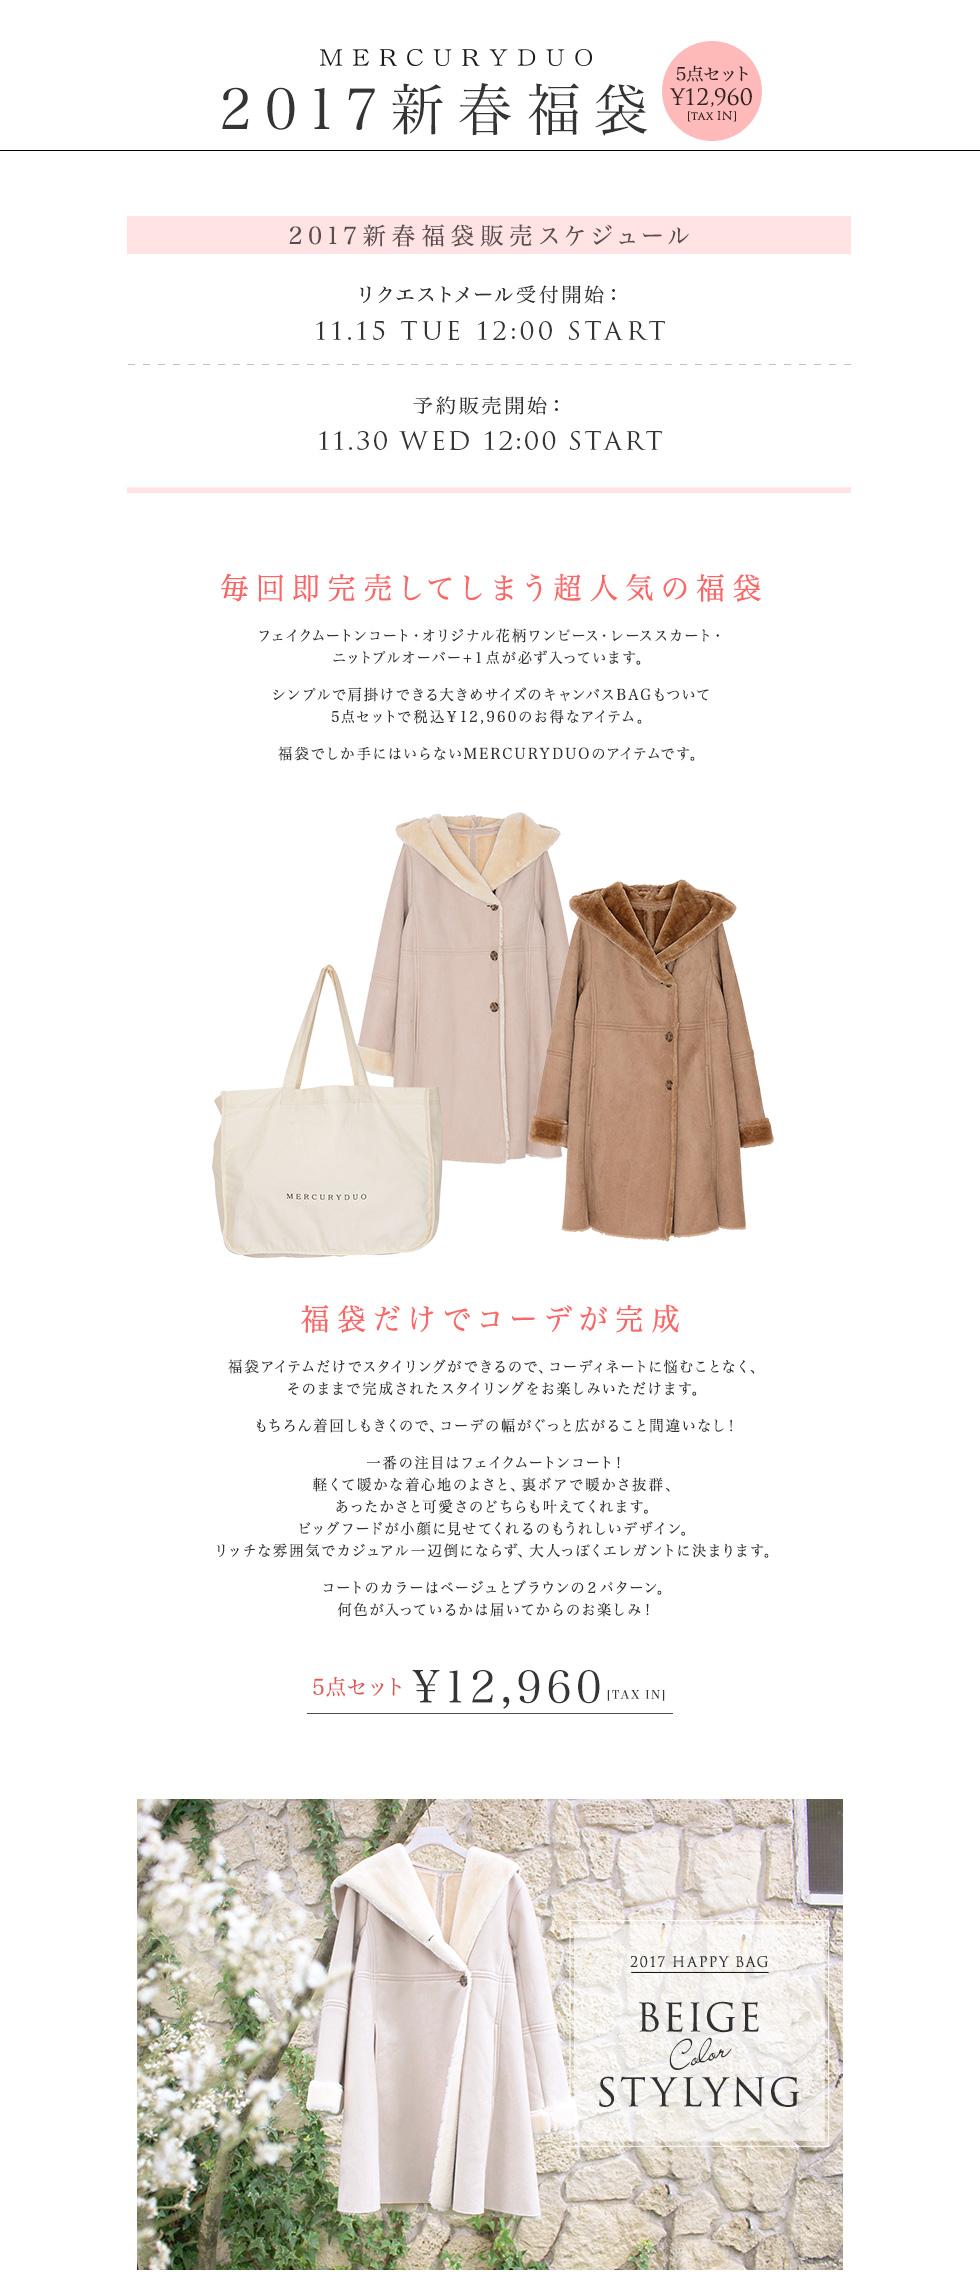 p_sp_md_161115_happybag_01